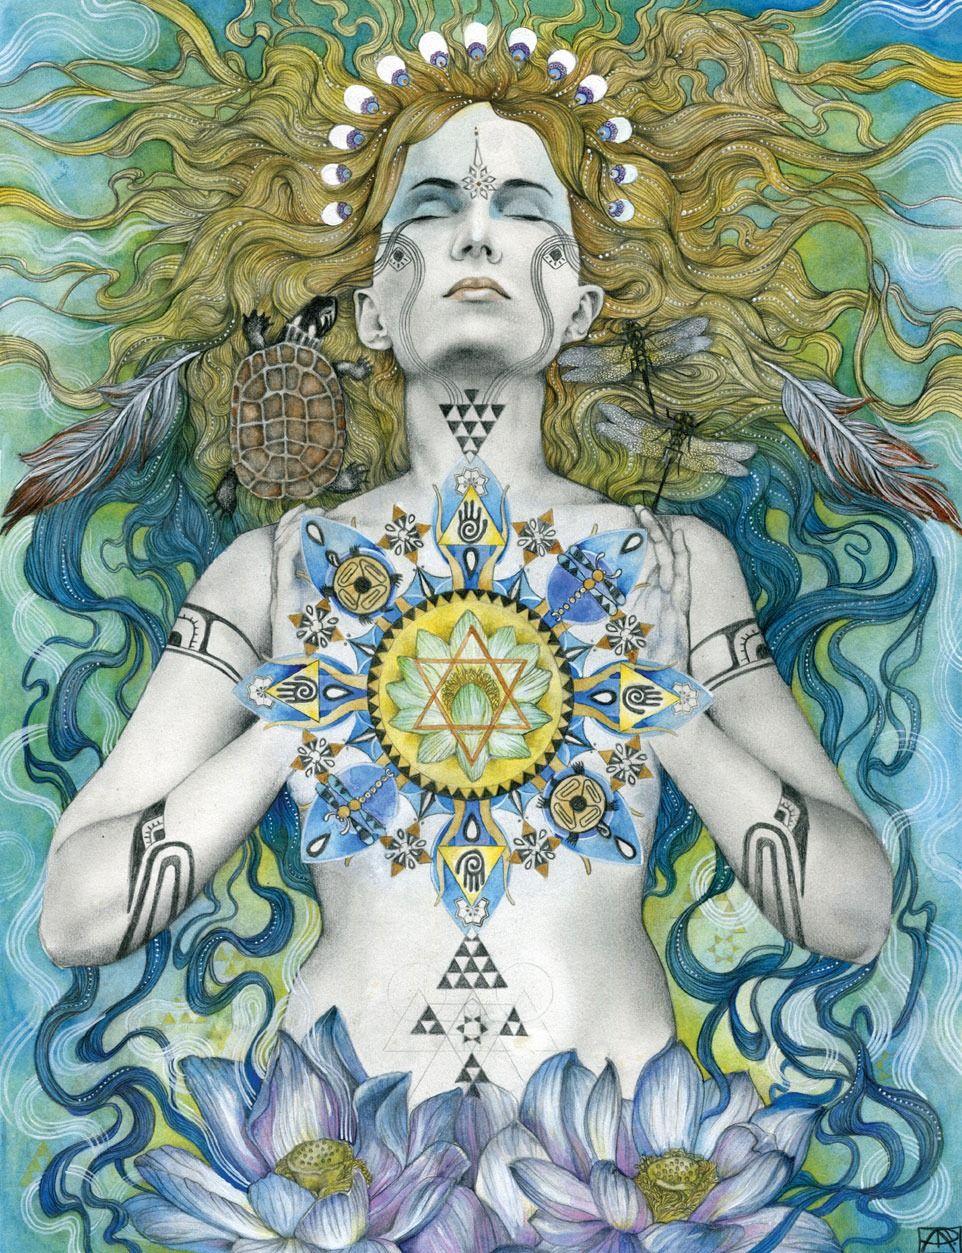 Wocekiye by patricia ariel the divine feminine pinterest wocekiye by energetic surrealist patricia ariel via sacred familiar biocorpaavc Images